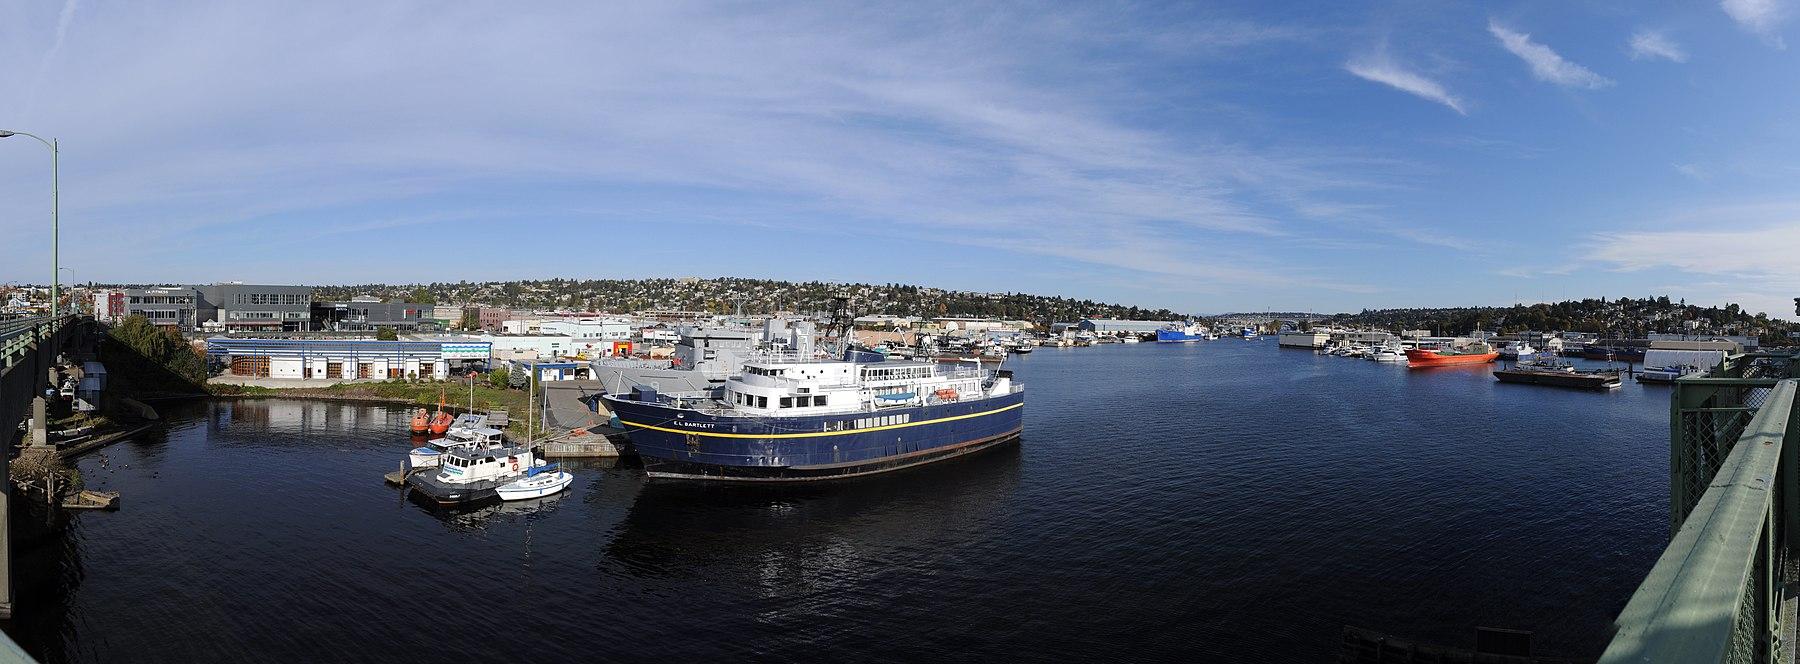 Looking east from Ballard Bridge. Seattle Maritime Academy at left.